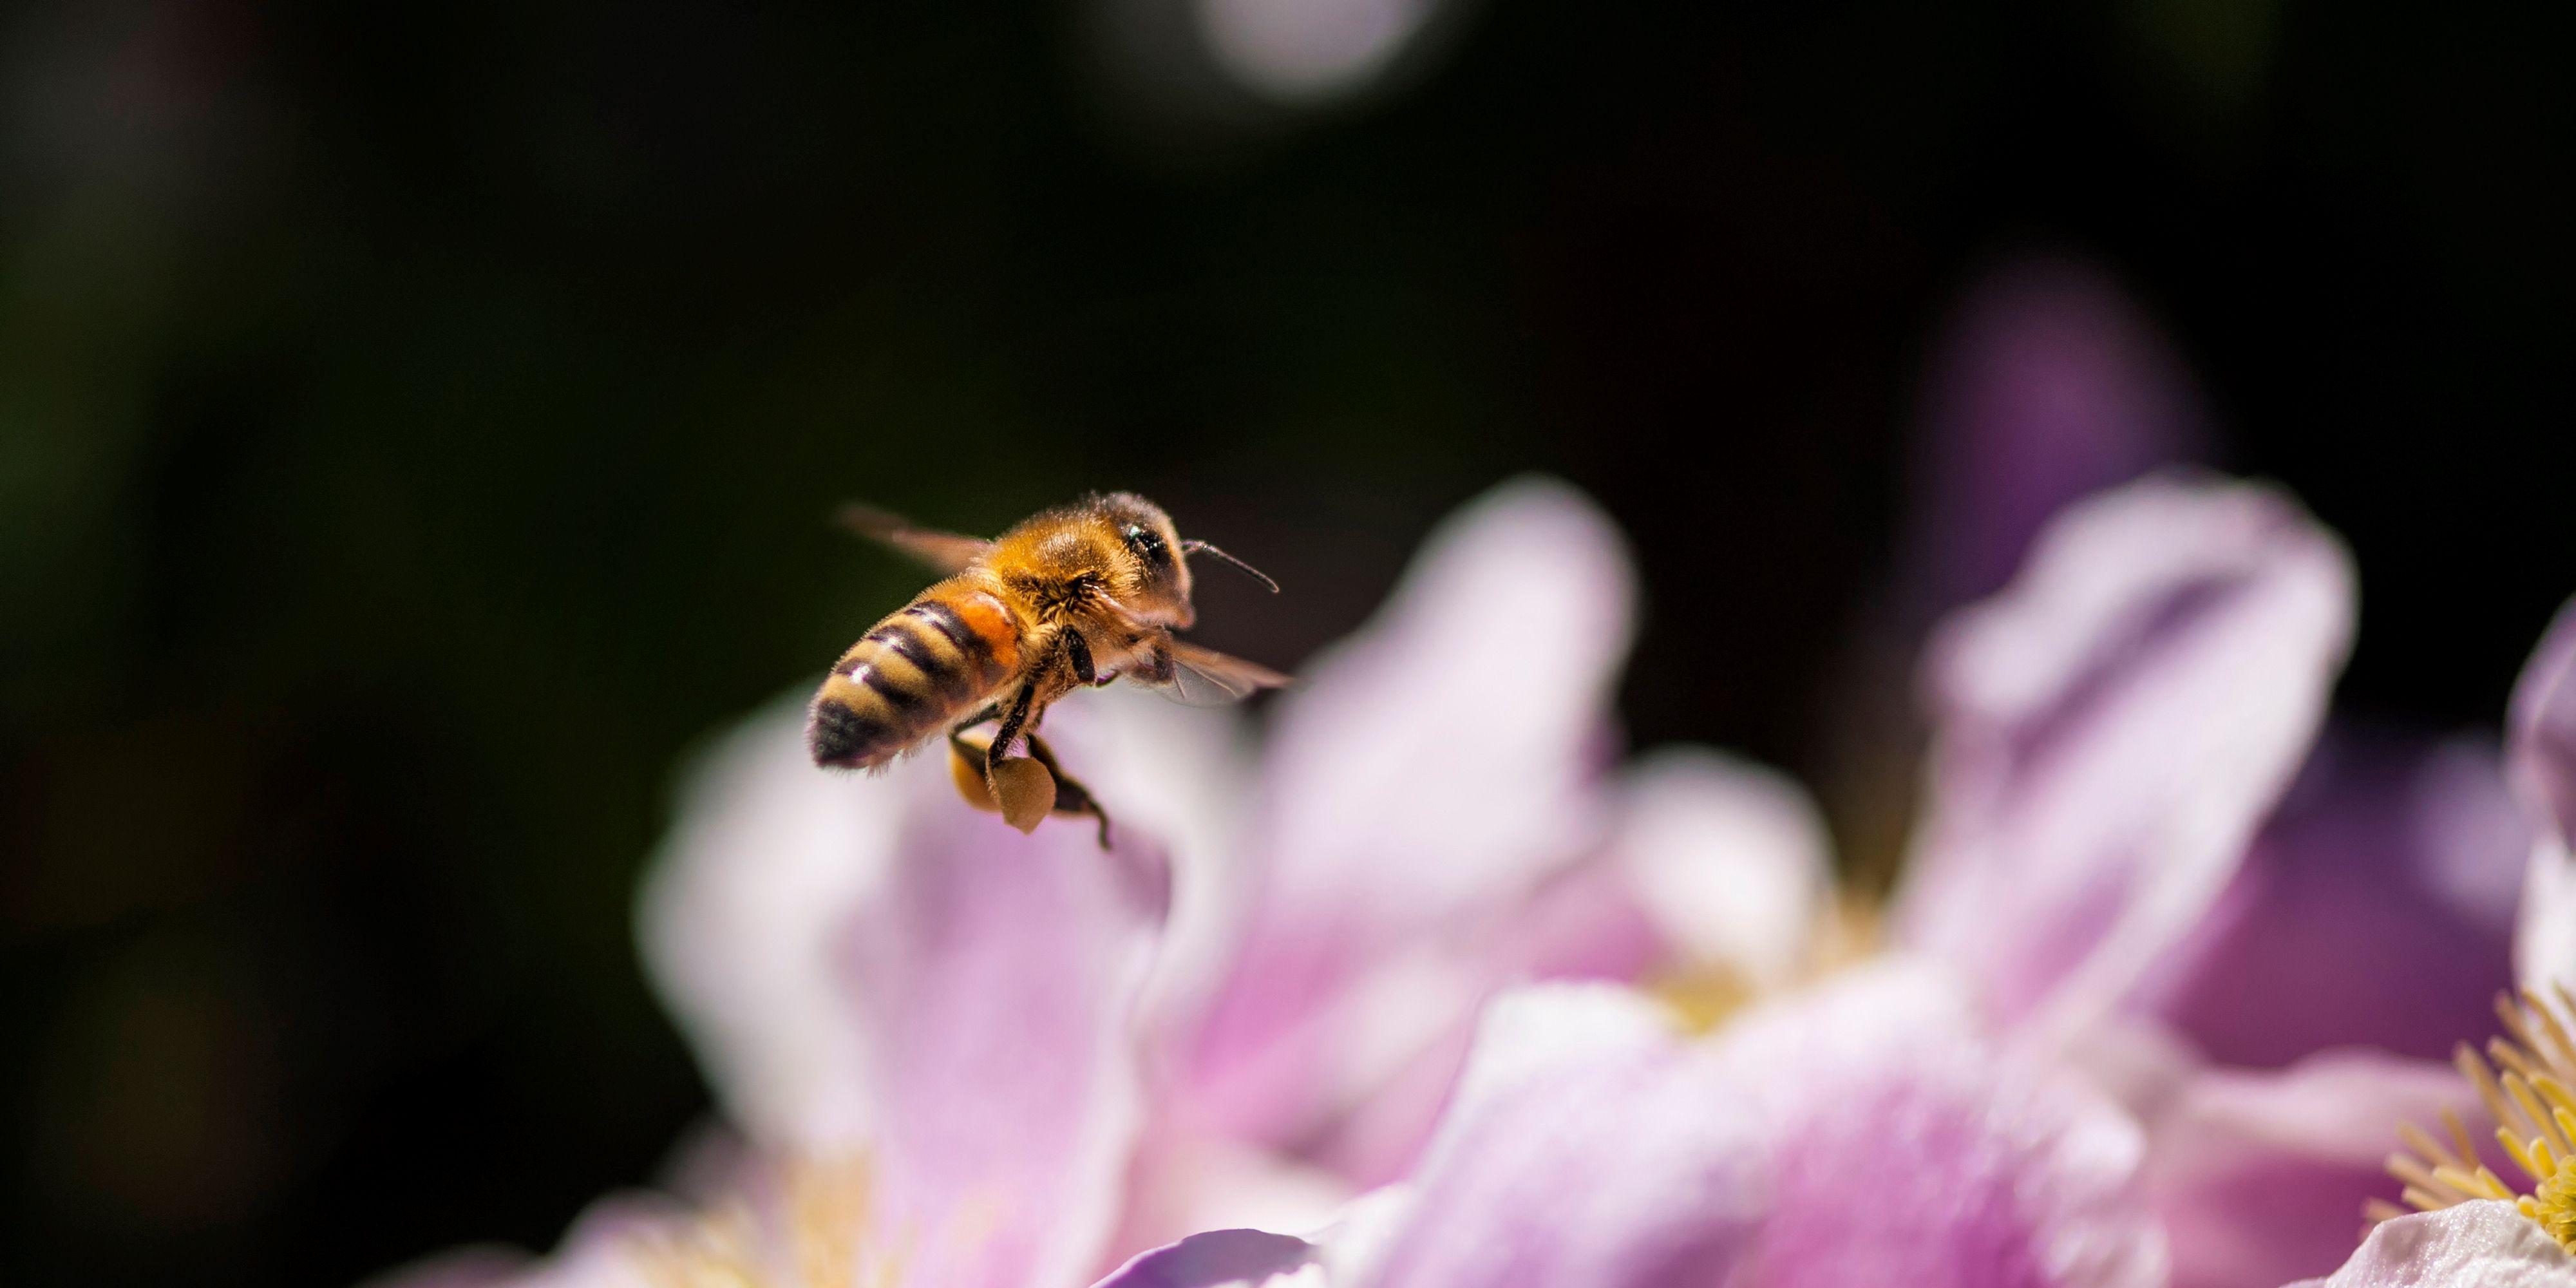 Flying bee near a sunflower